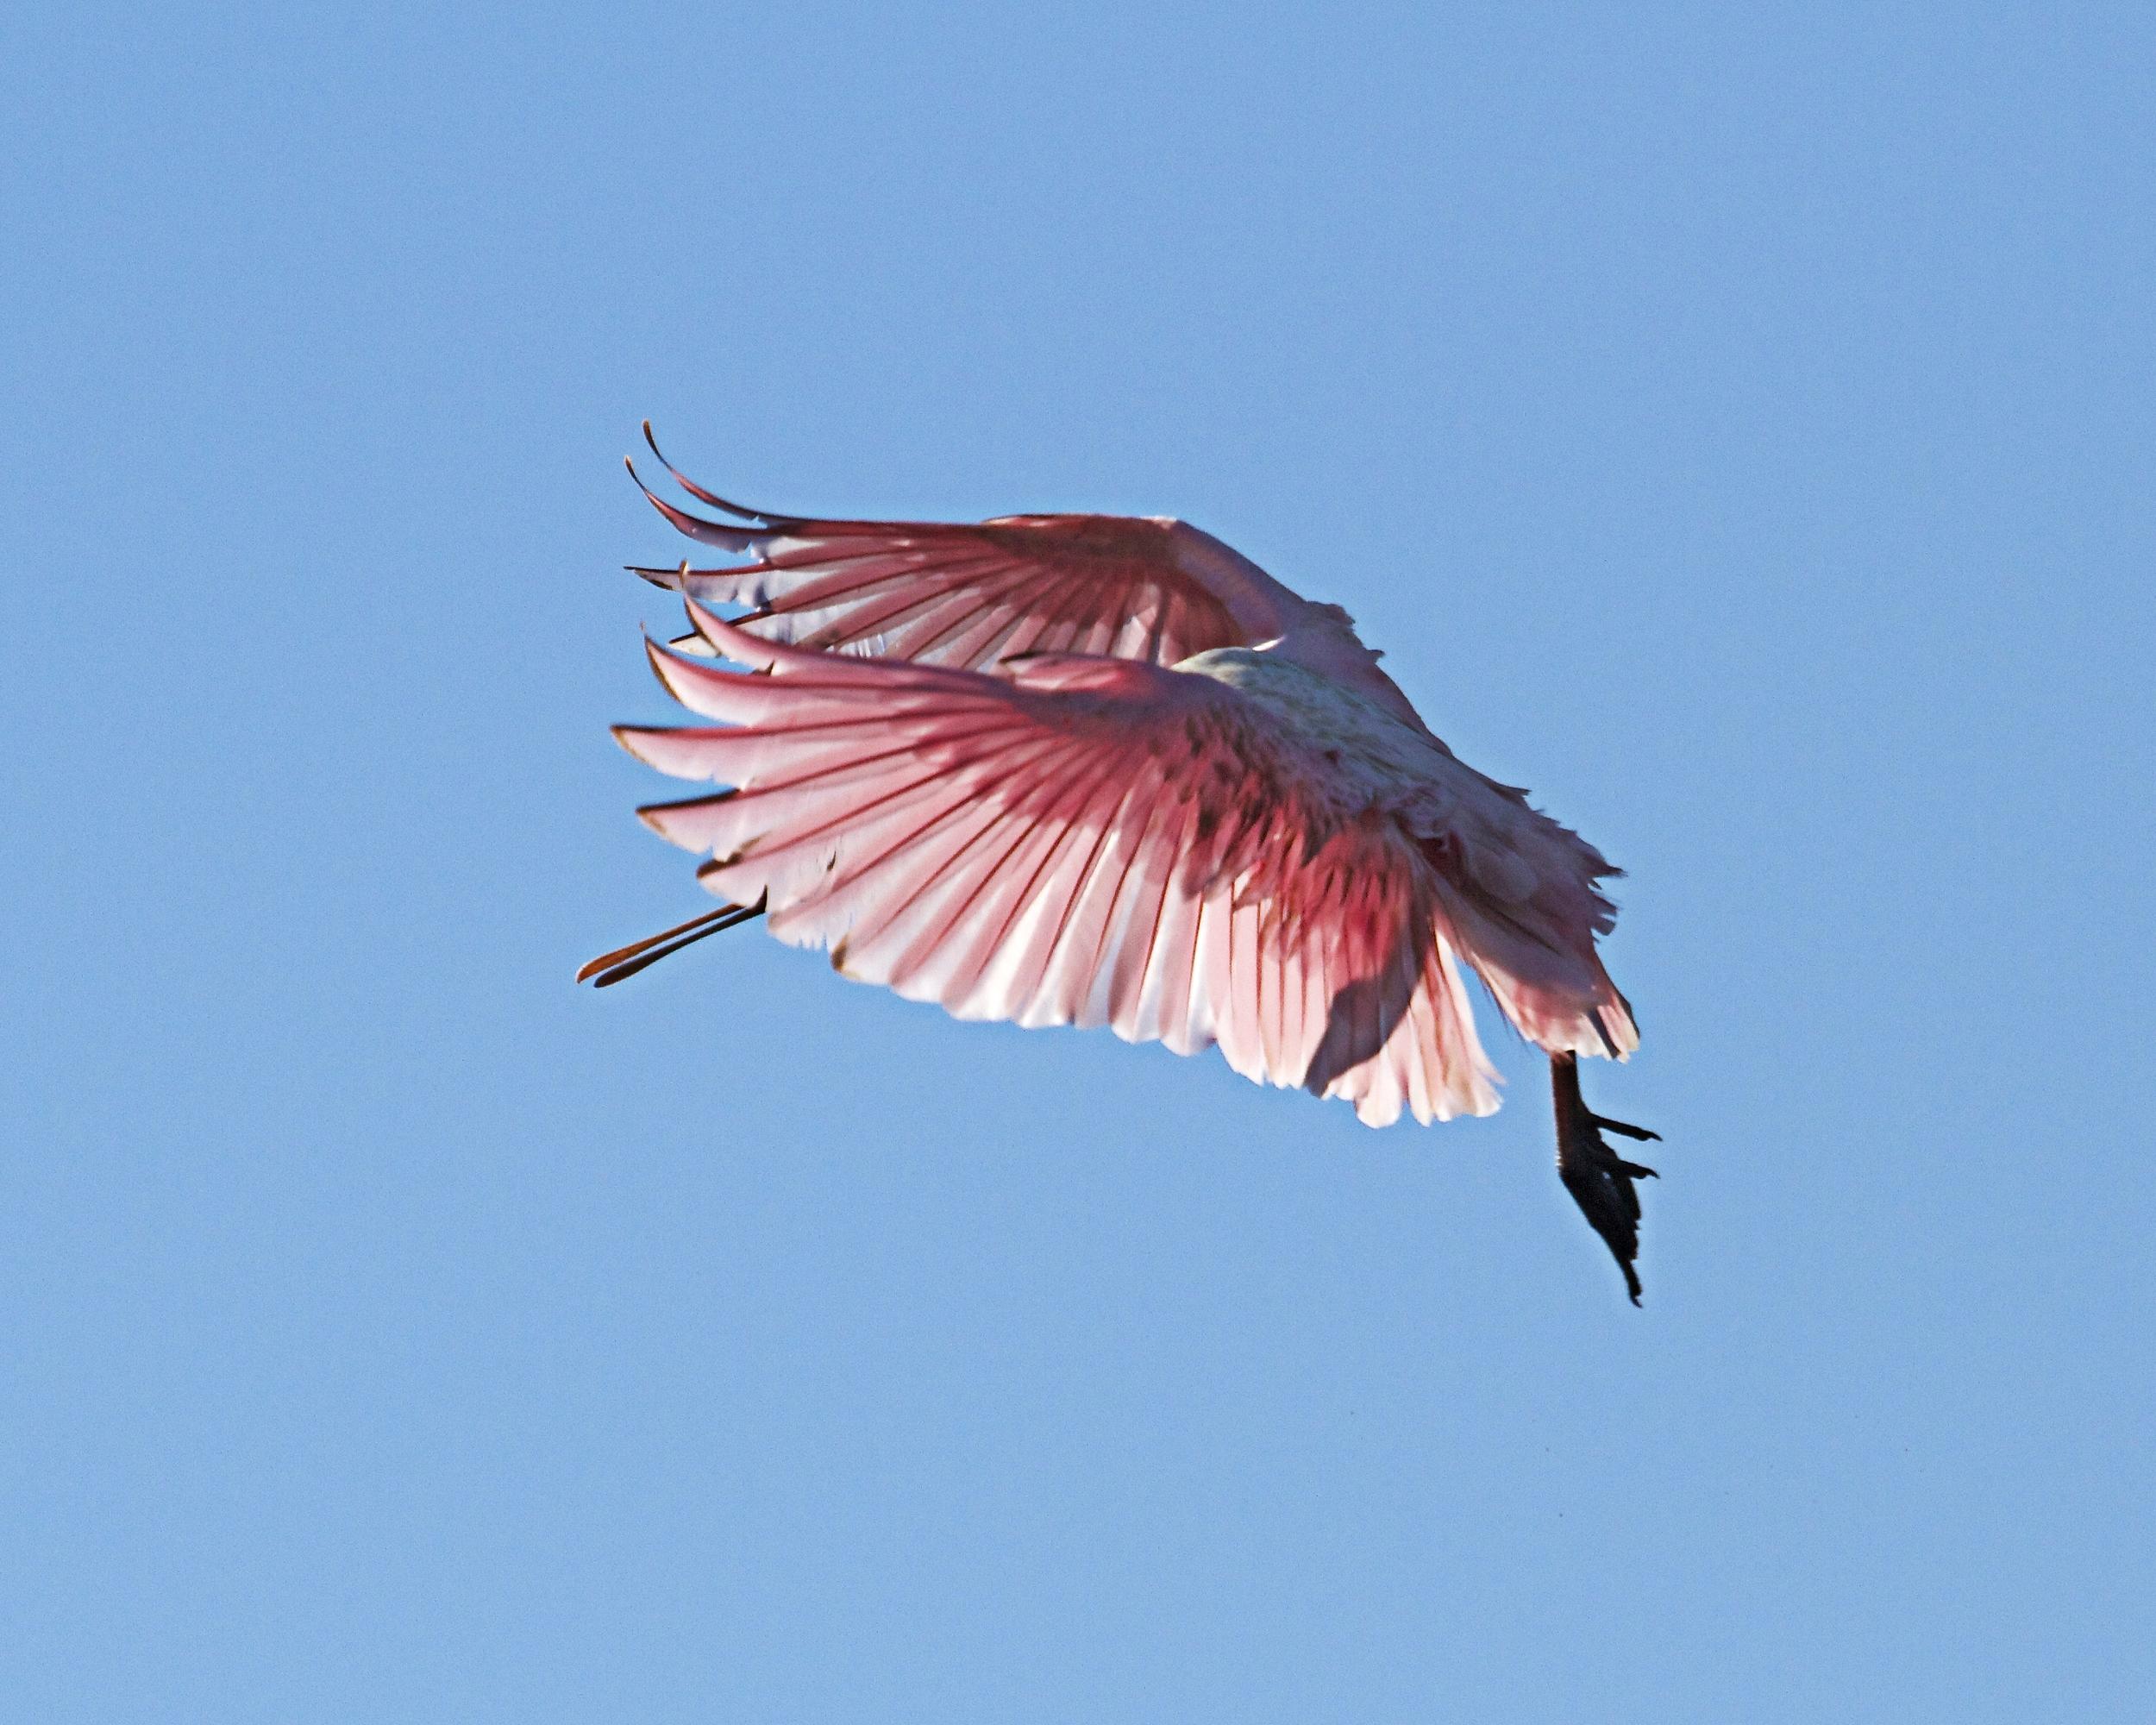 A pink angle's sunlit Plie.